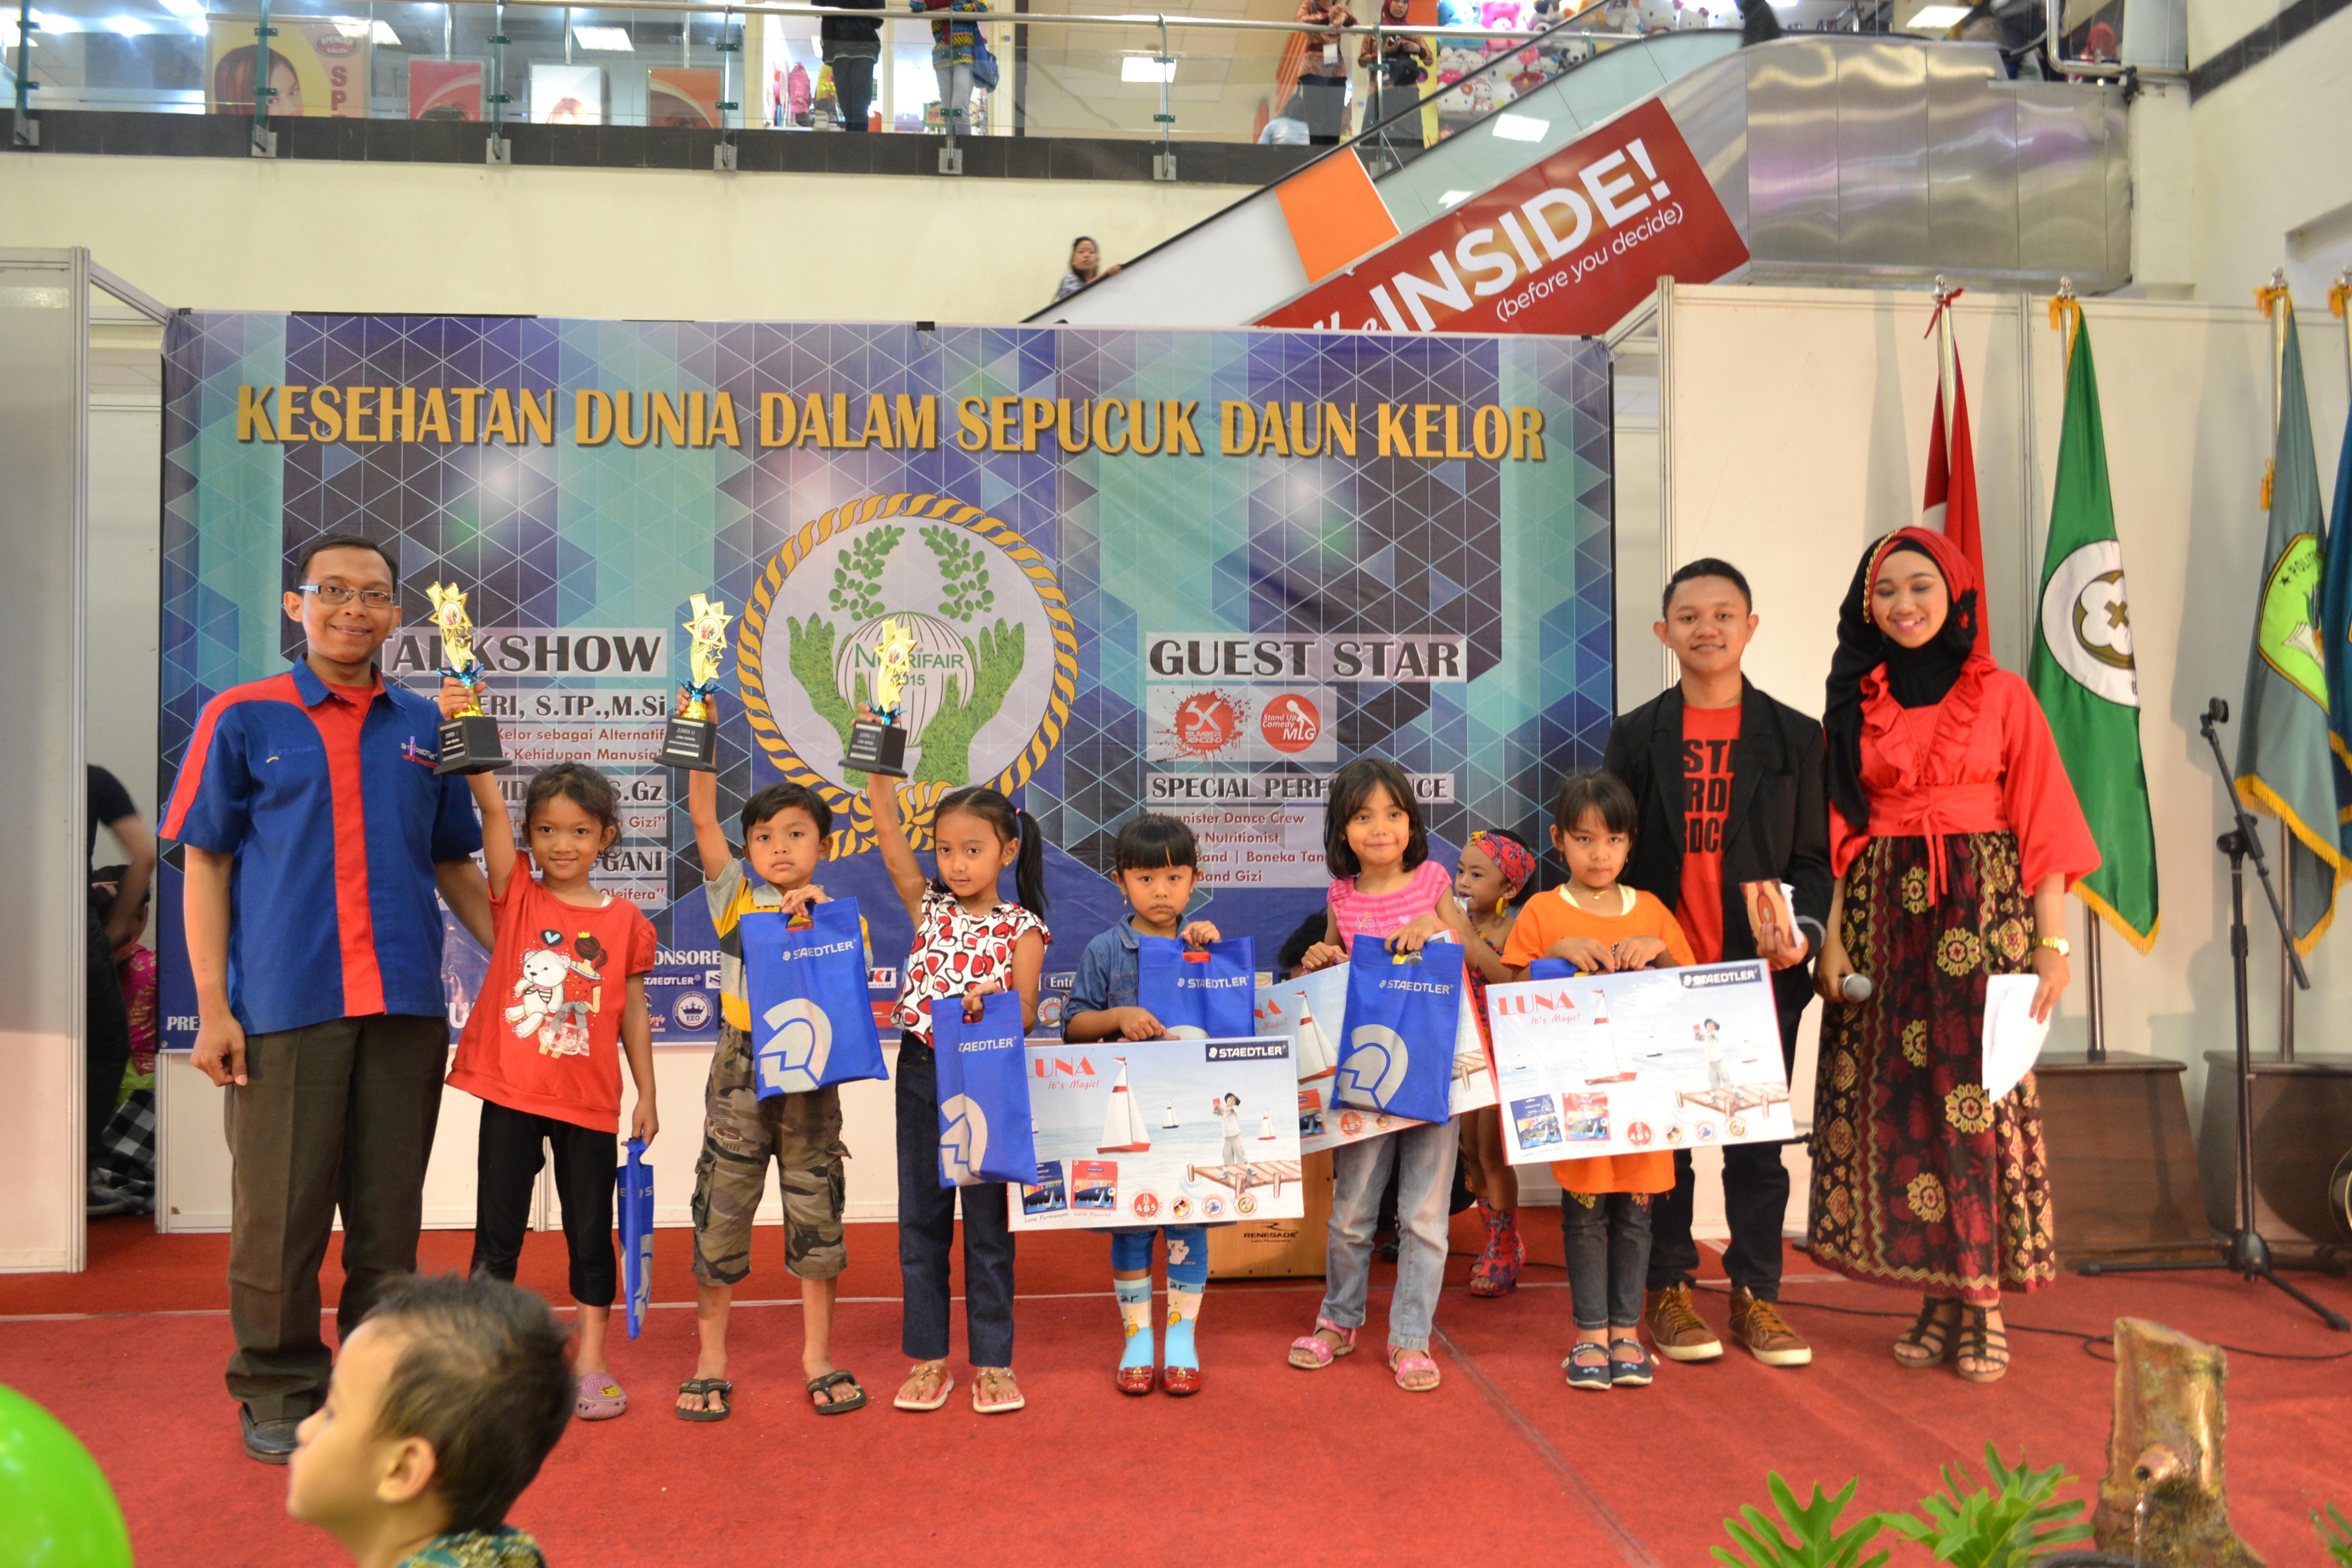 Pameran Gizi Rangka Nutrifair2016 Malang Town Squere Matos Kab